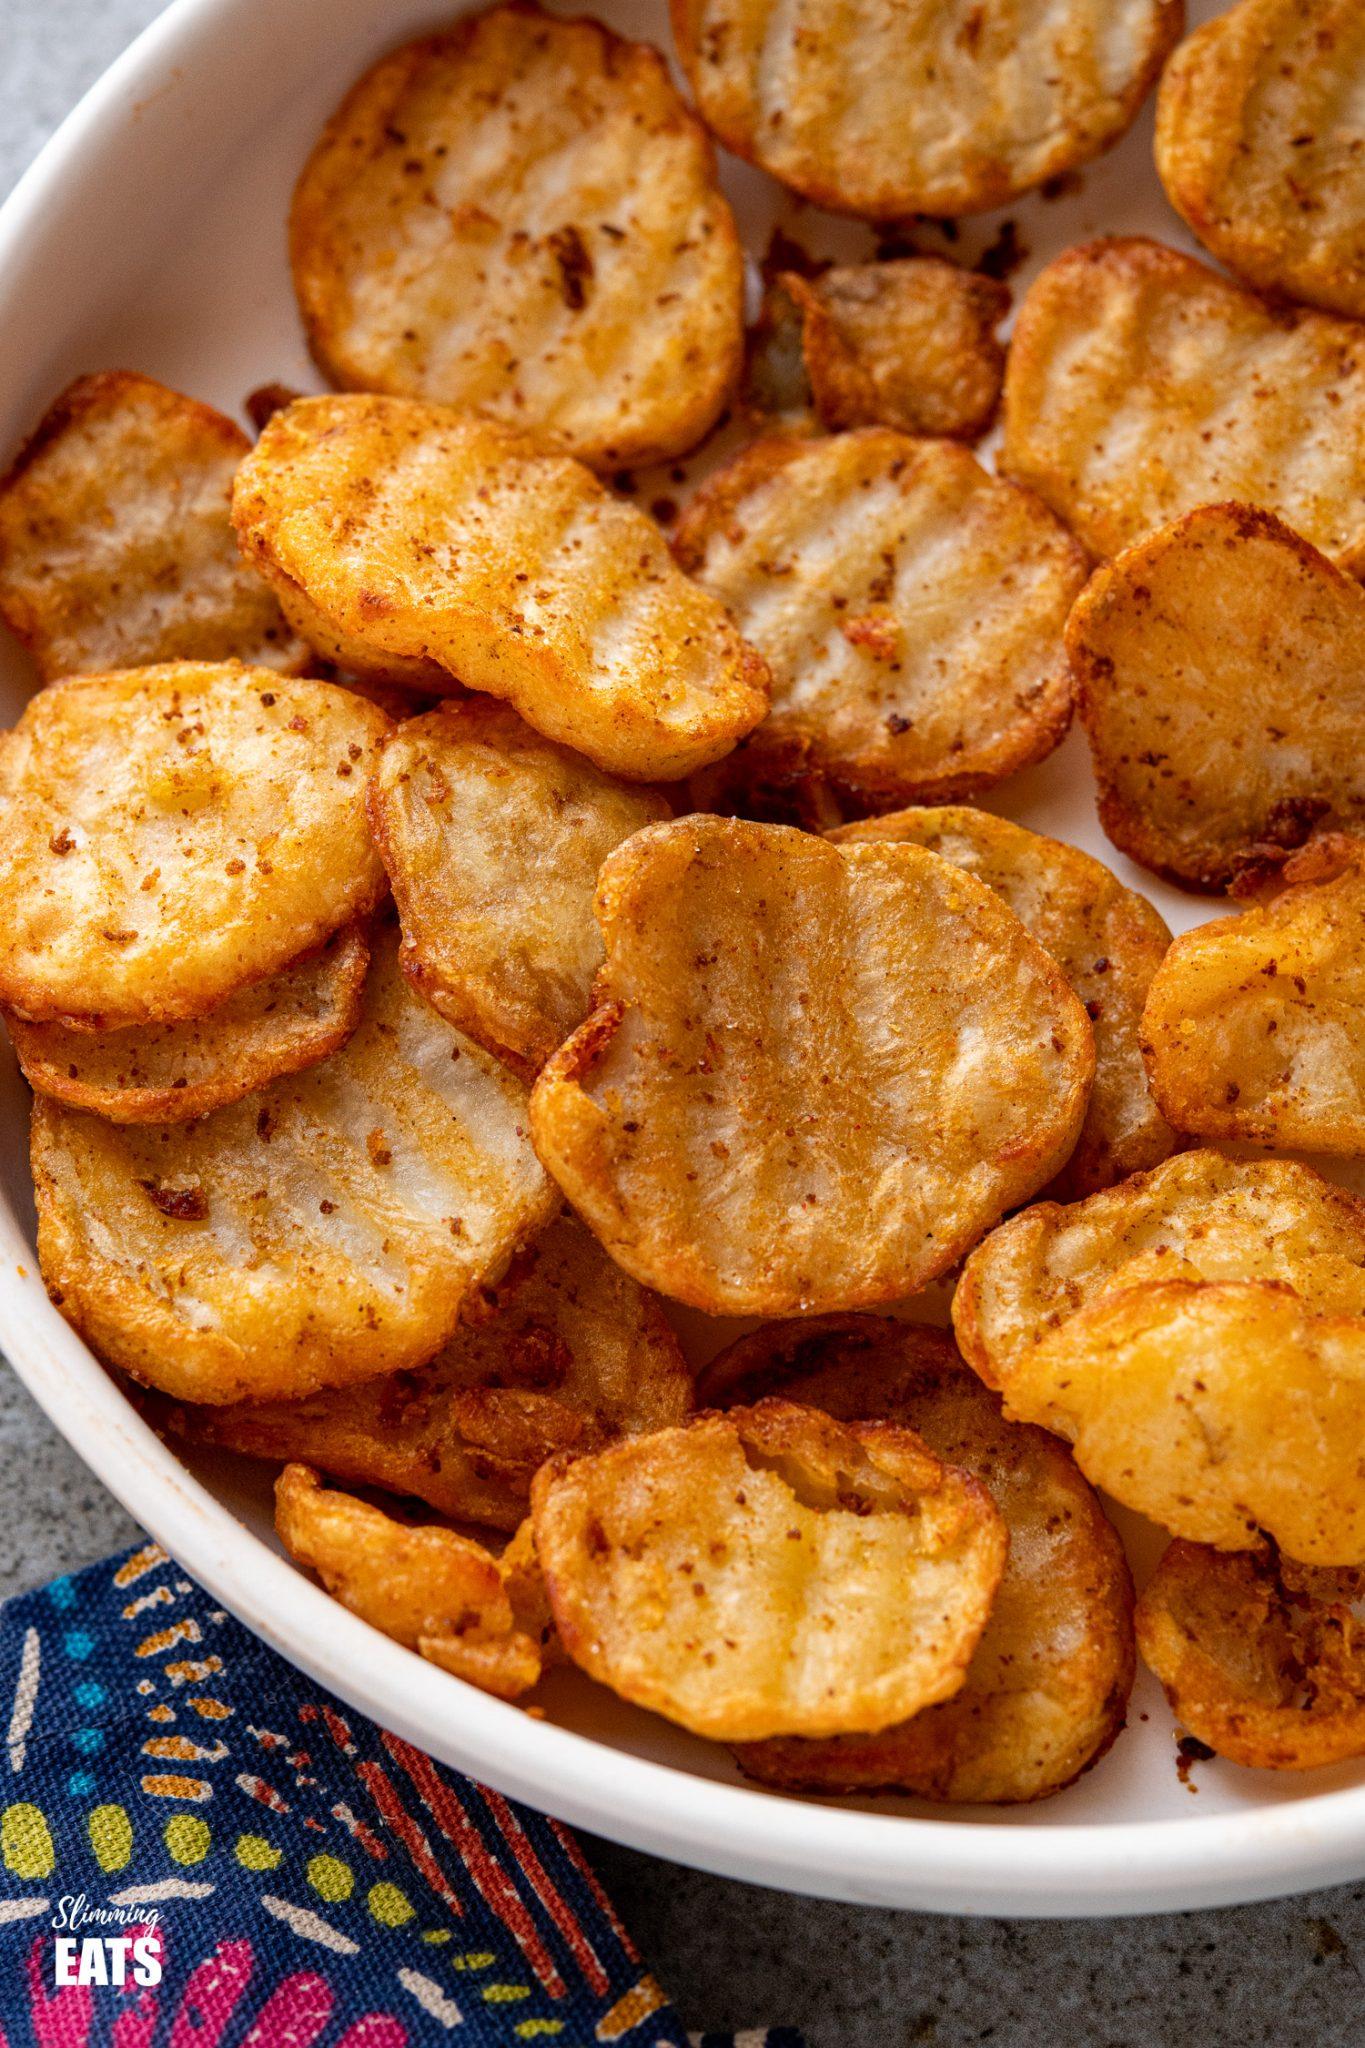 close up of crispy potato slices in white bowl